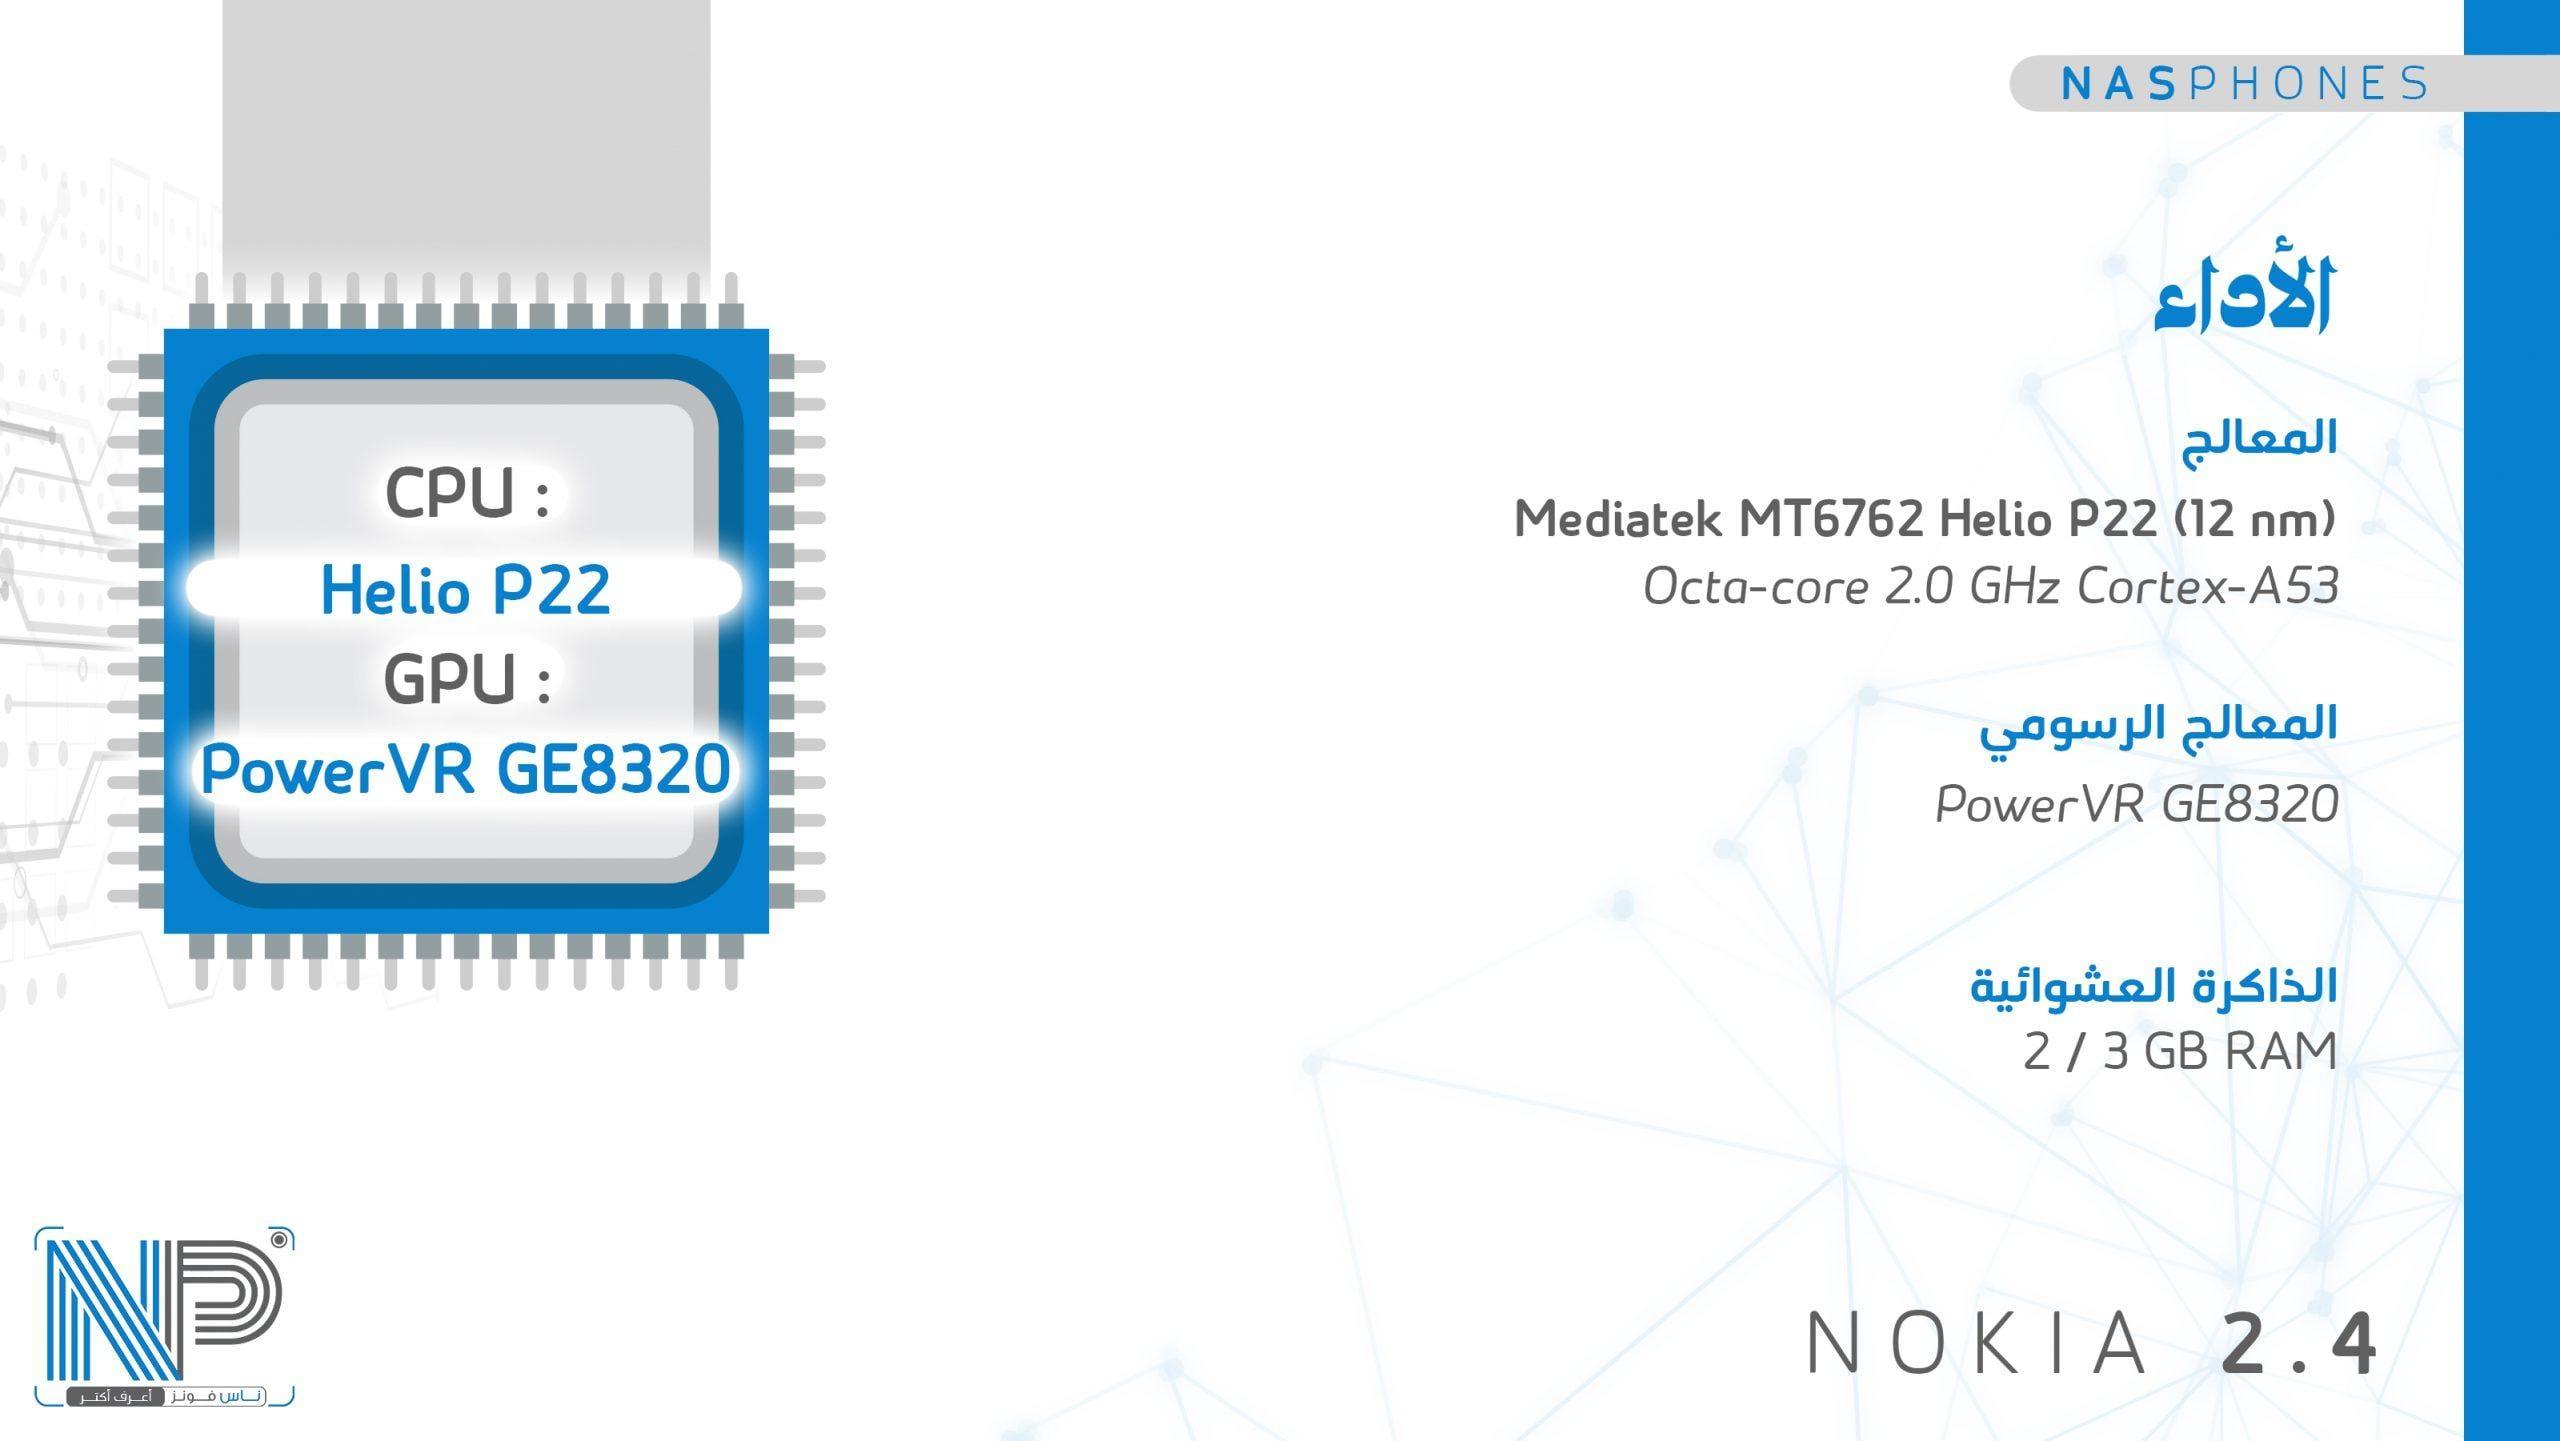 أداء موبايل Nokia 2.4